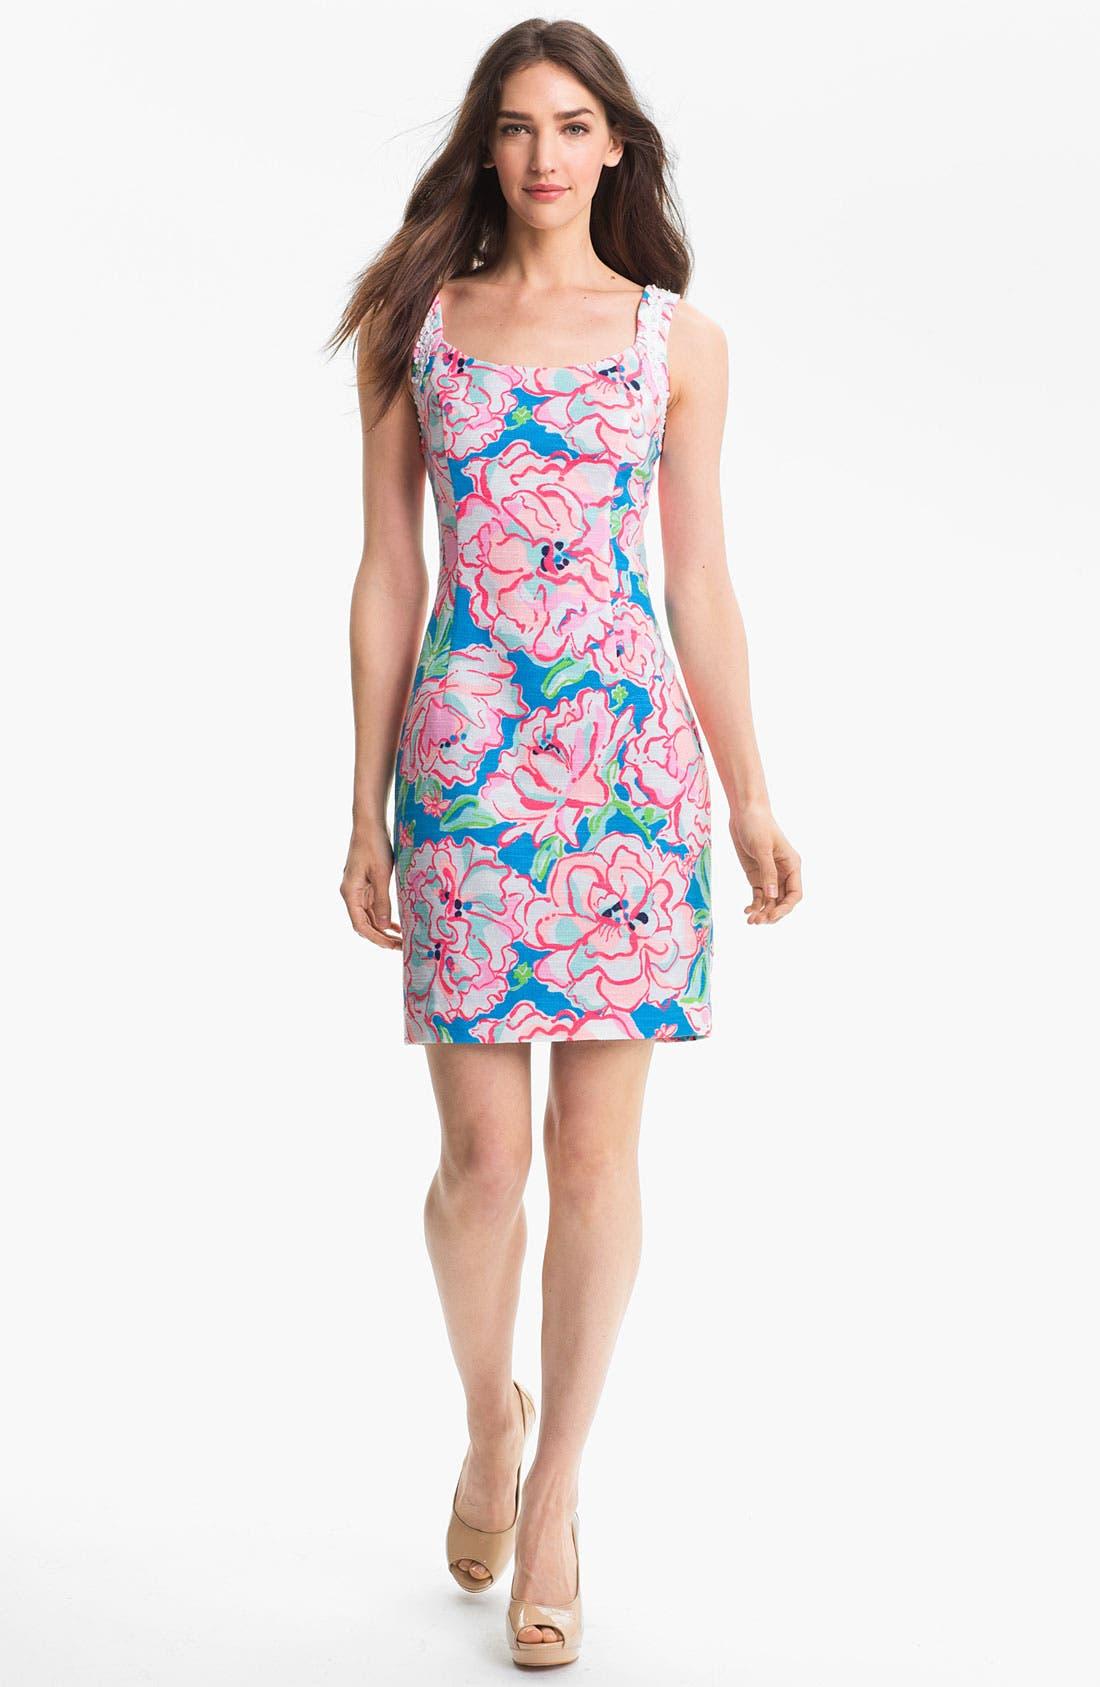 Main Image - Lilly Pulitzer® 'Nienie' Print Sheath Dress